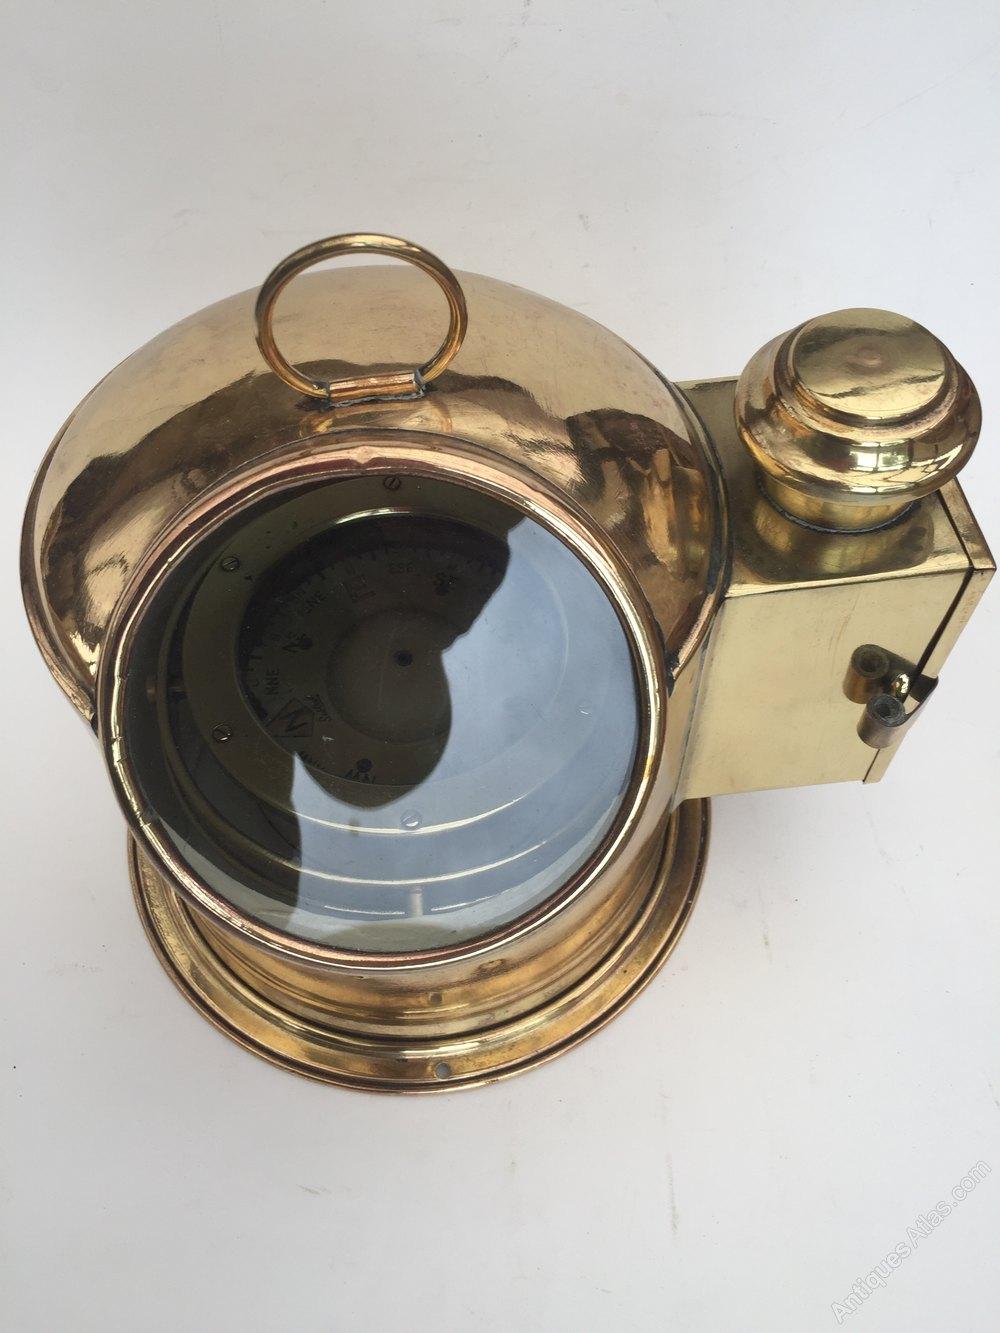 Antique Maritime Binnacle Compass In Brass - Antique Brass